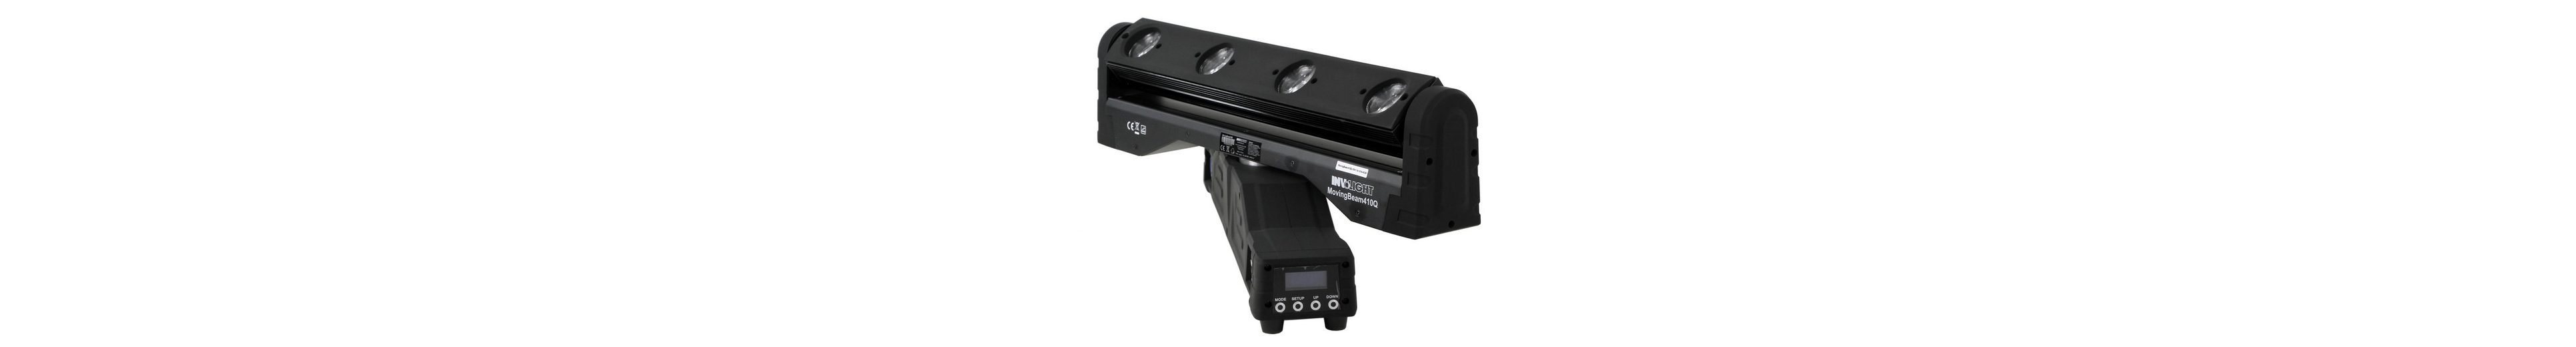 Involight Beam-Lichteffektgerät »MovingBeam410Q«